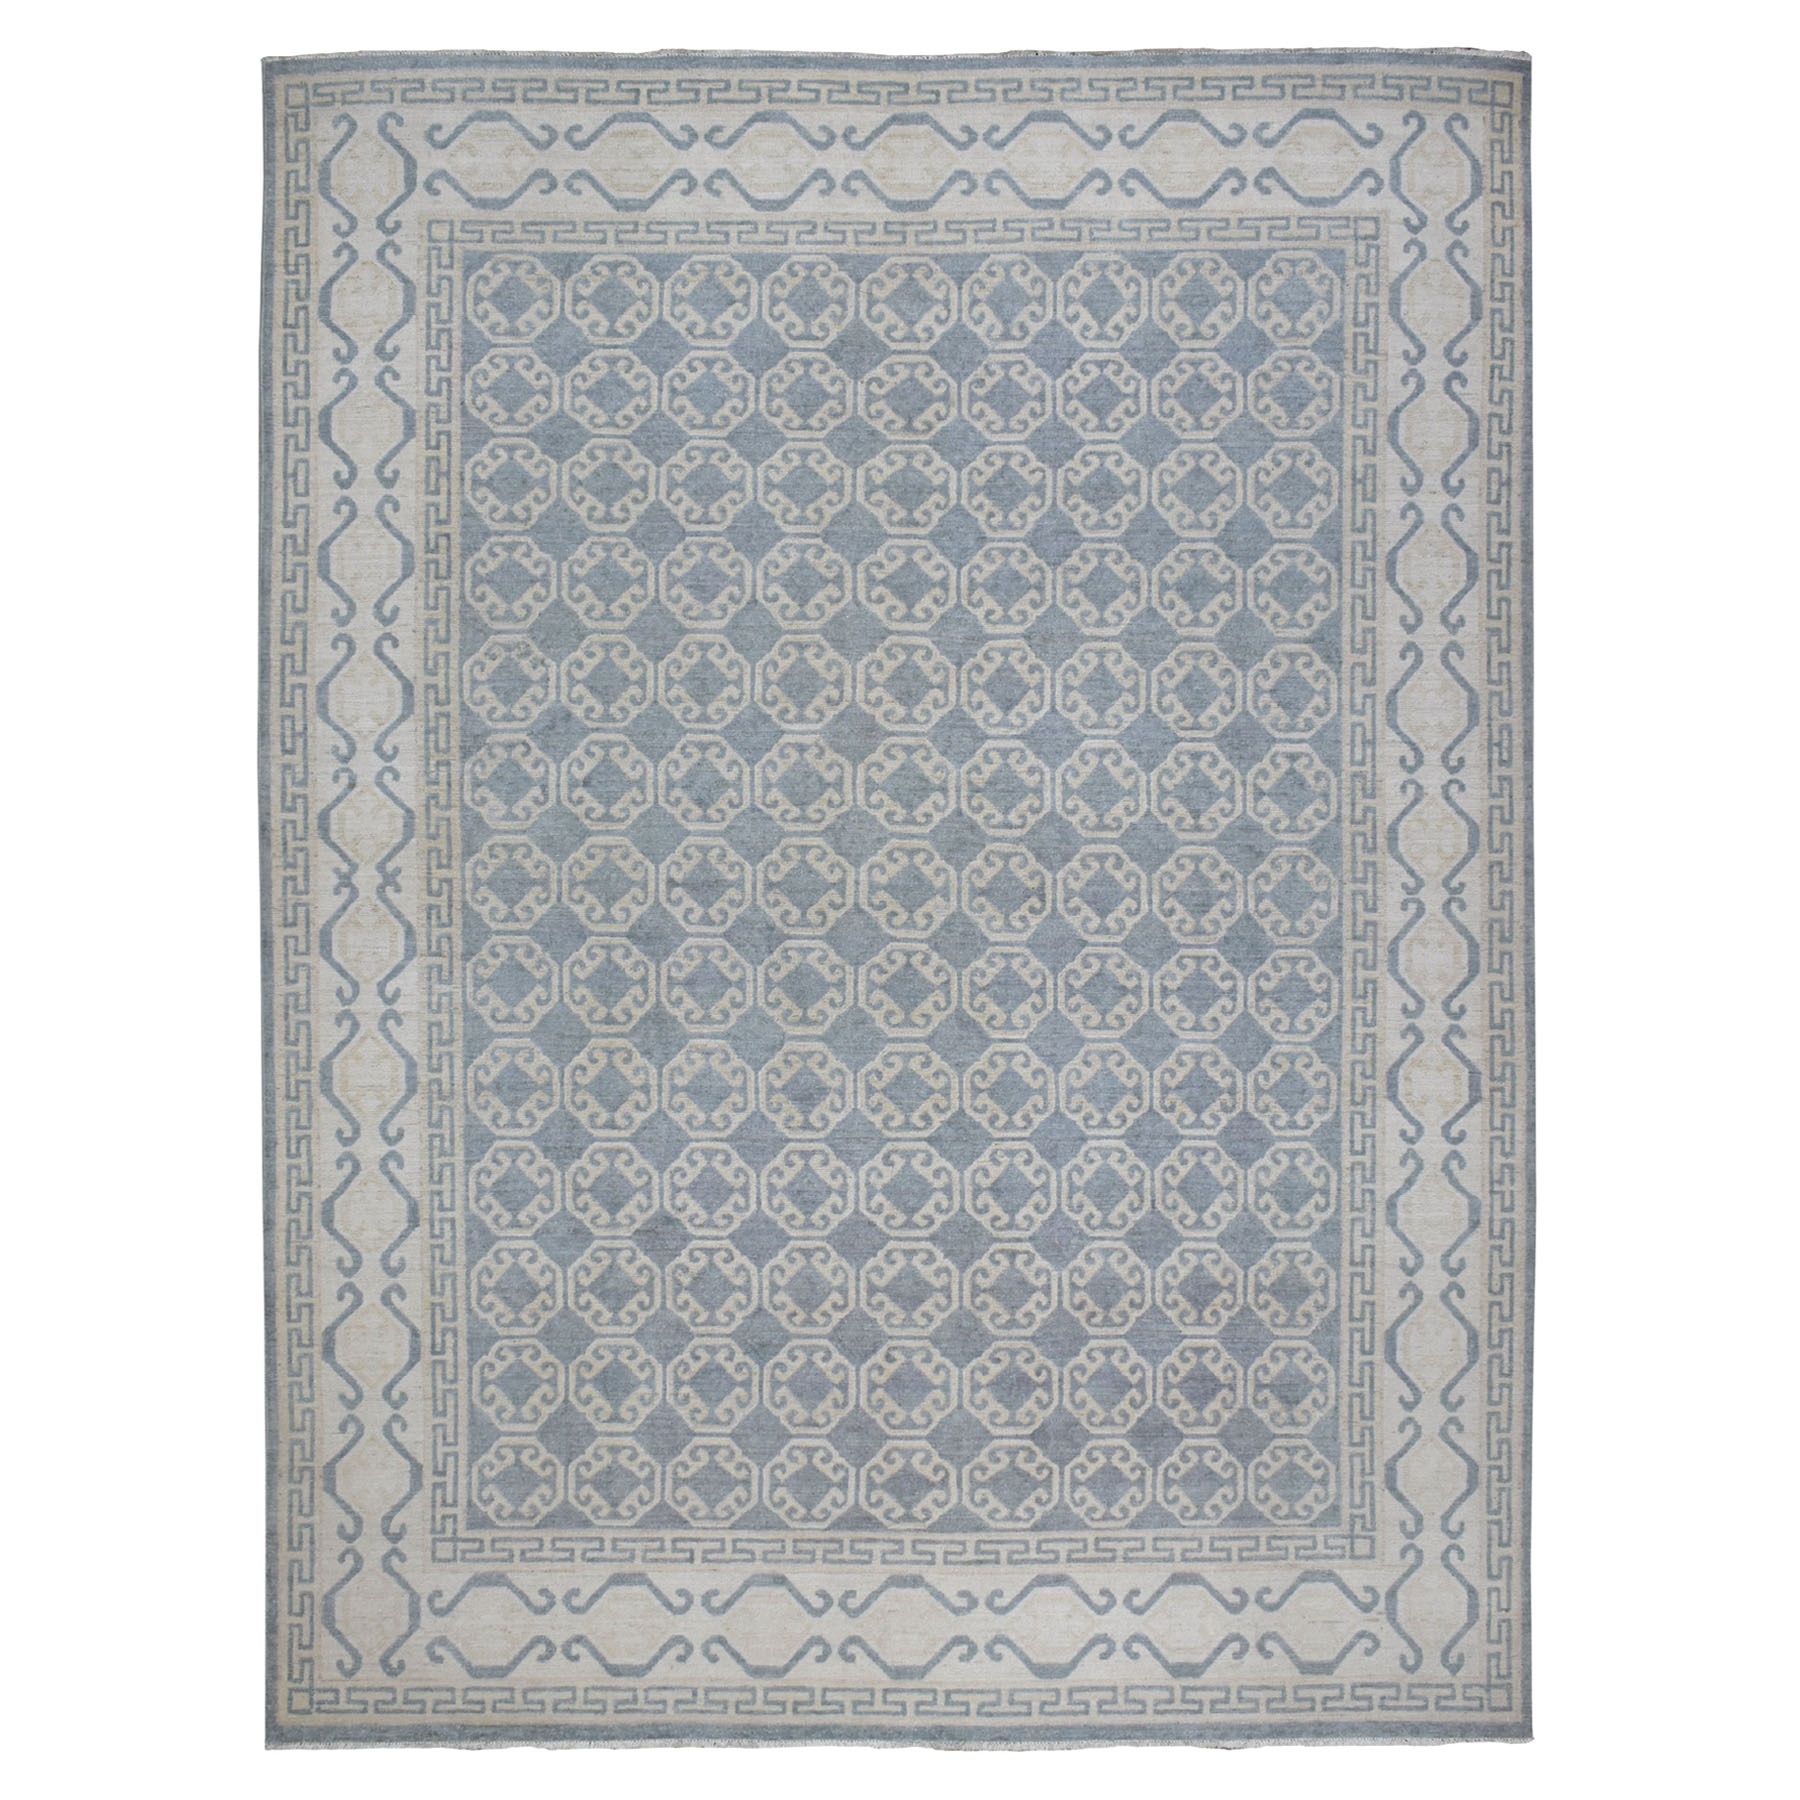 "8'9""x11'1"" White Wash Peshawar Khotan Design Pure Wool Hand Knotted Oriental Rug"